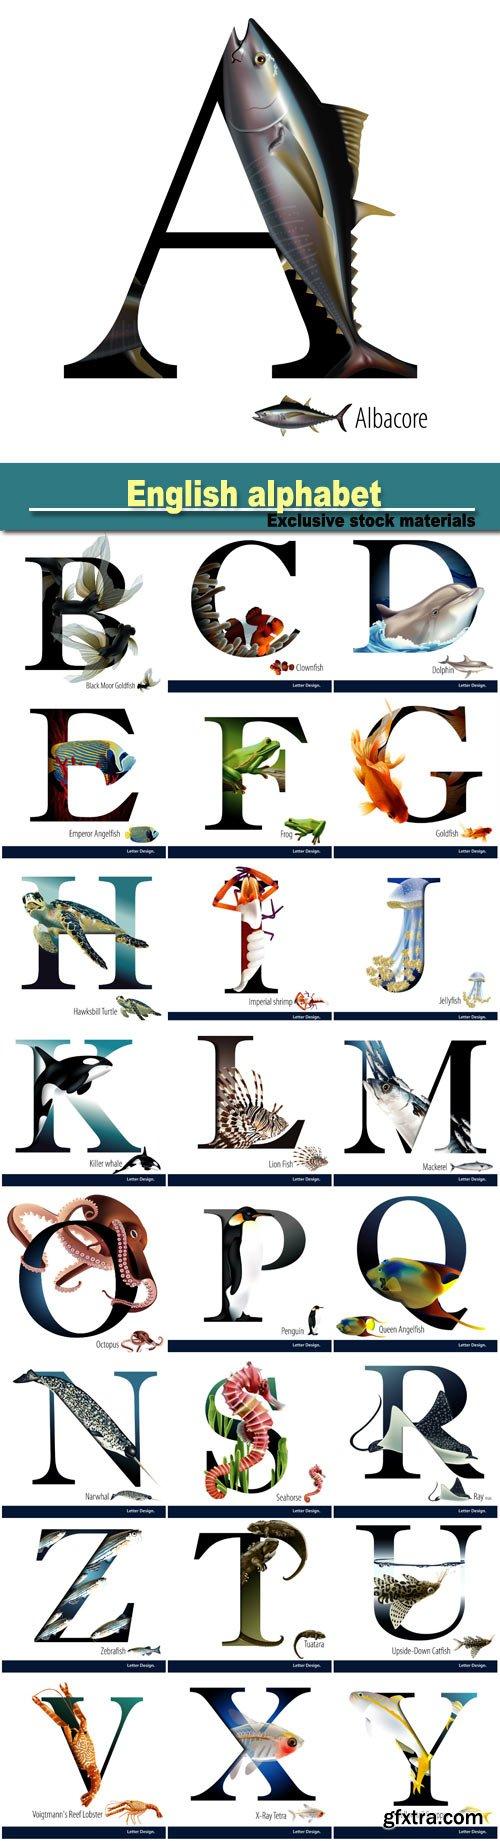 English alphabet in a marine style